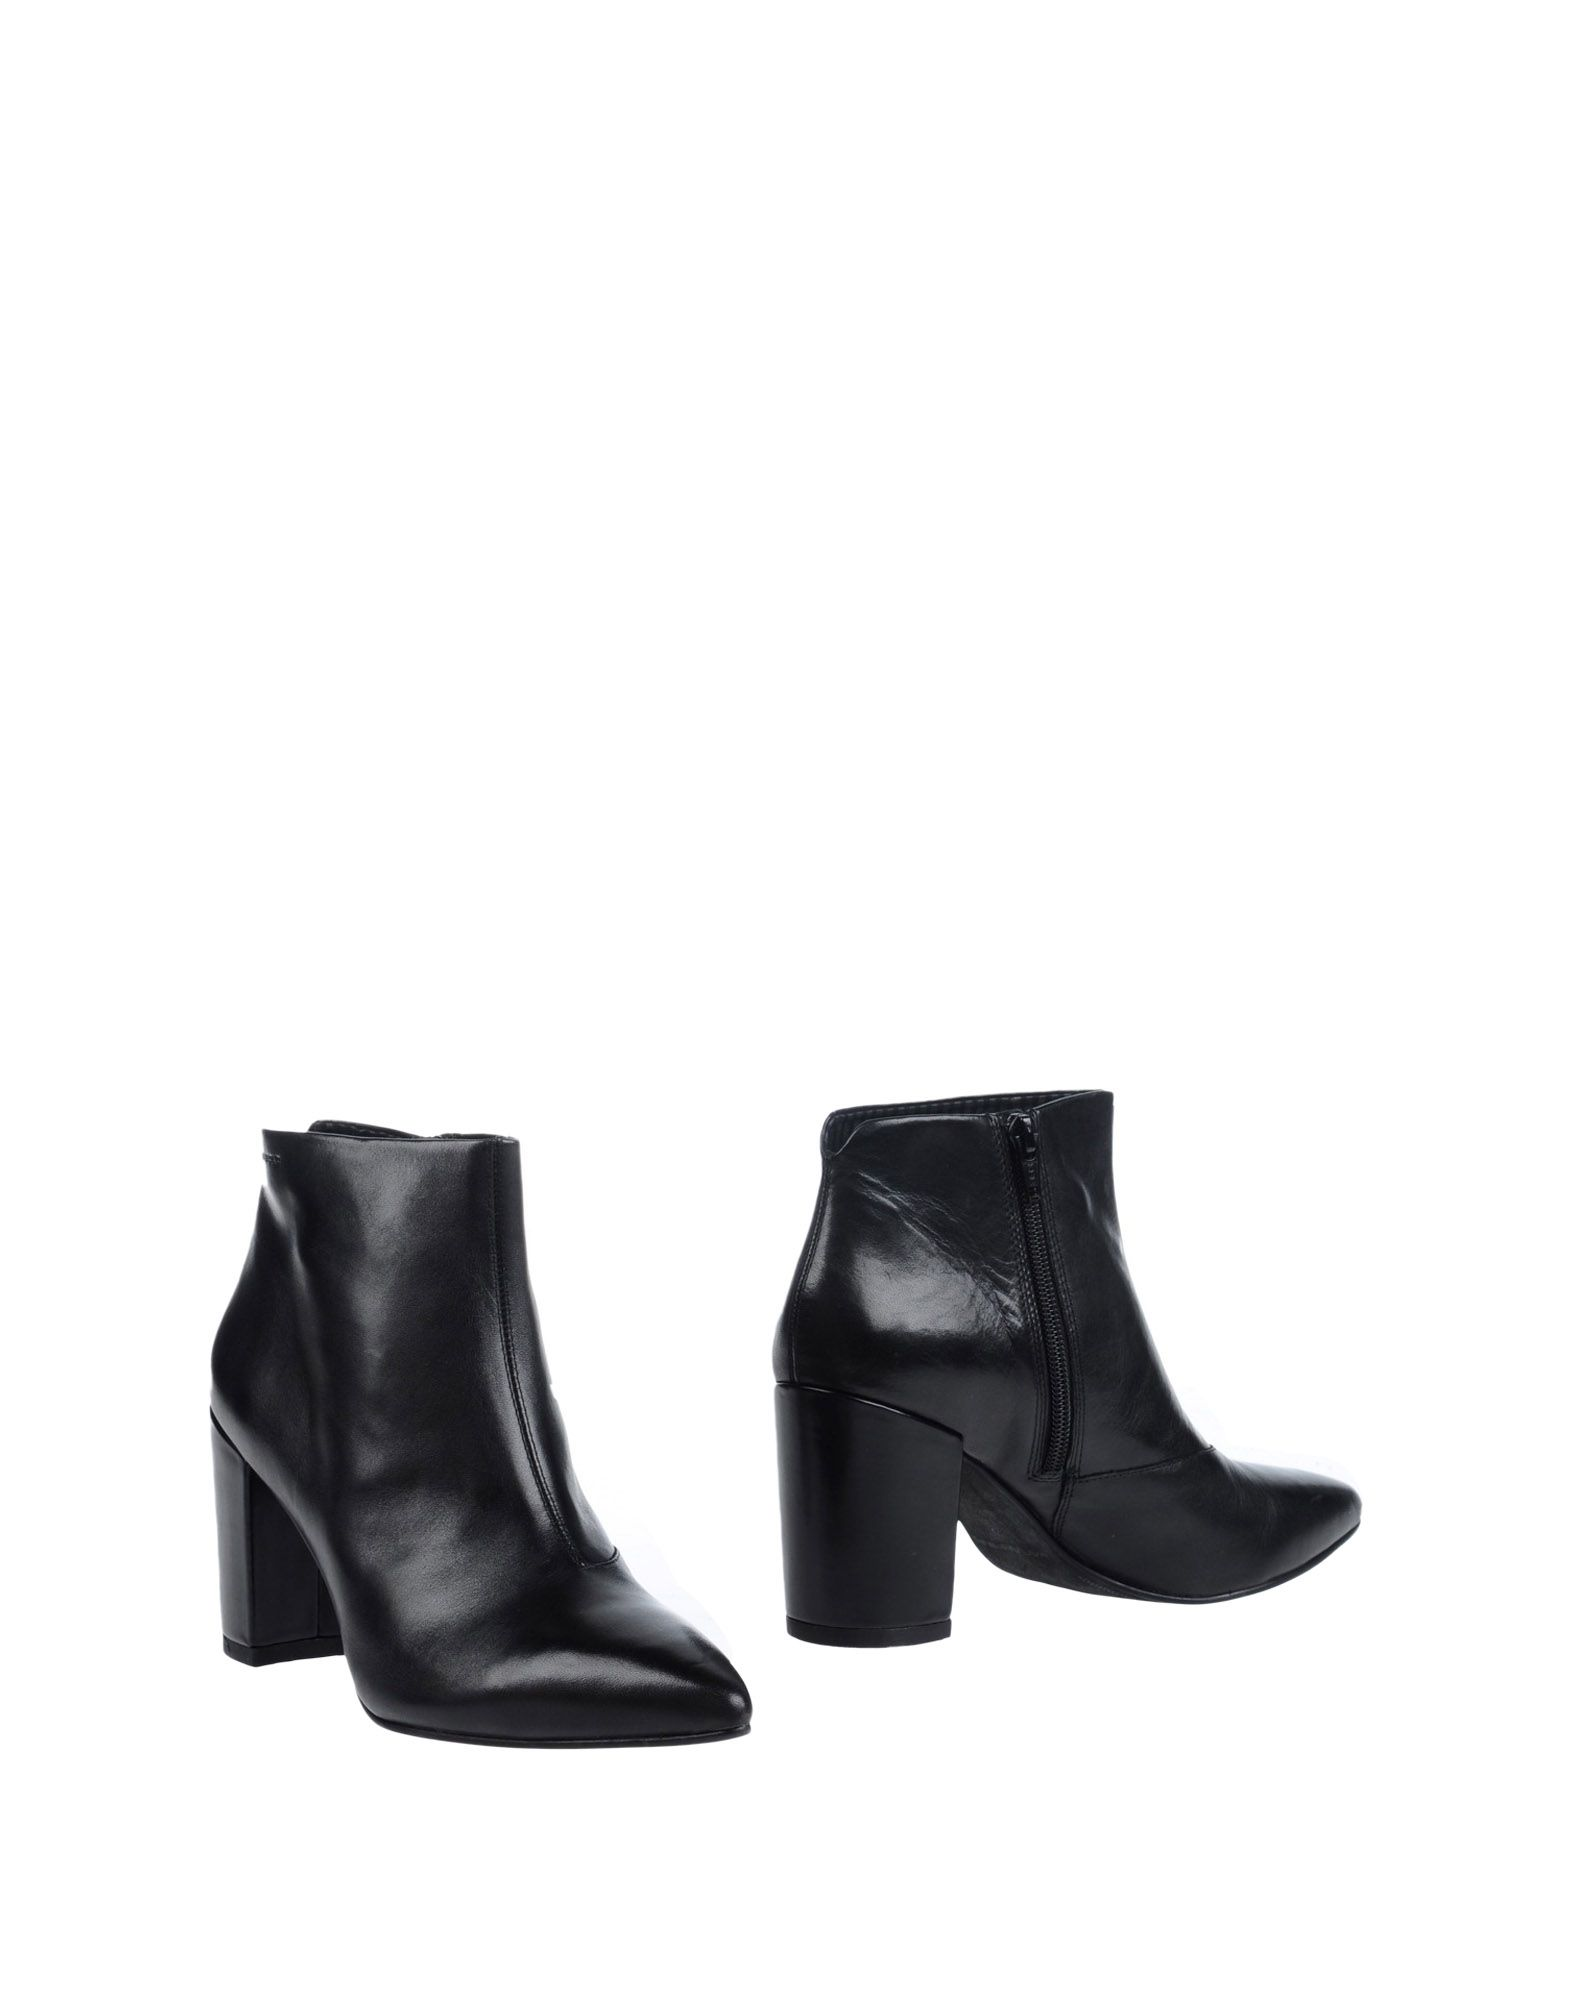 Stivaletti Vagabond Shoemakers Donna Donna Shoemakers - 11268184RN a711b6